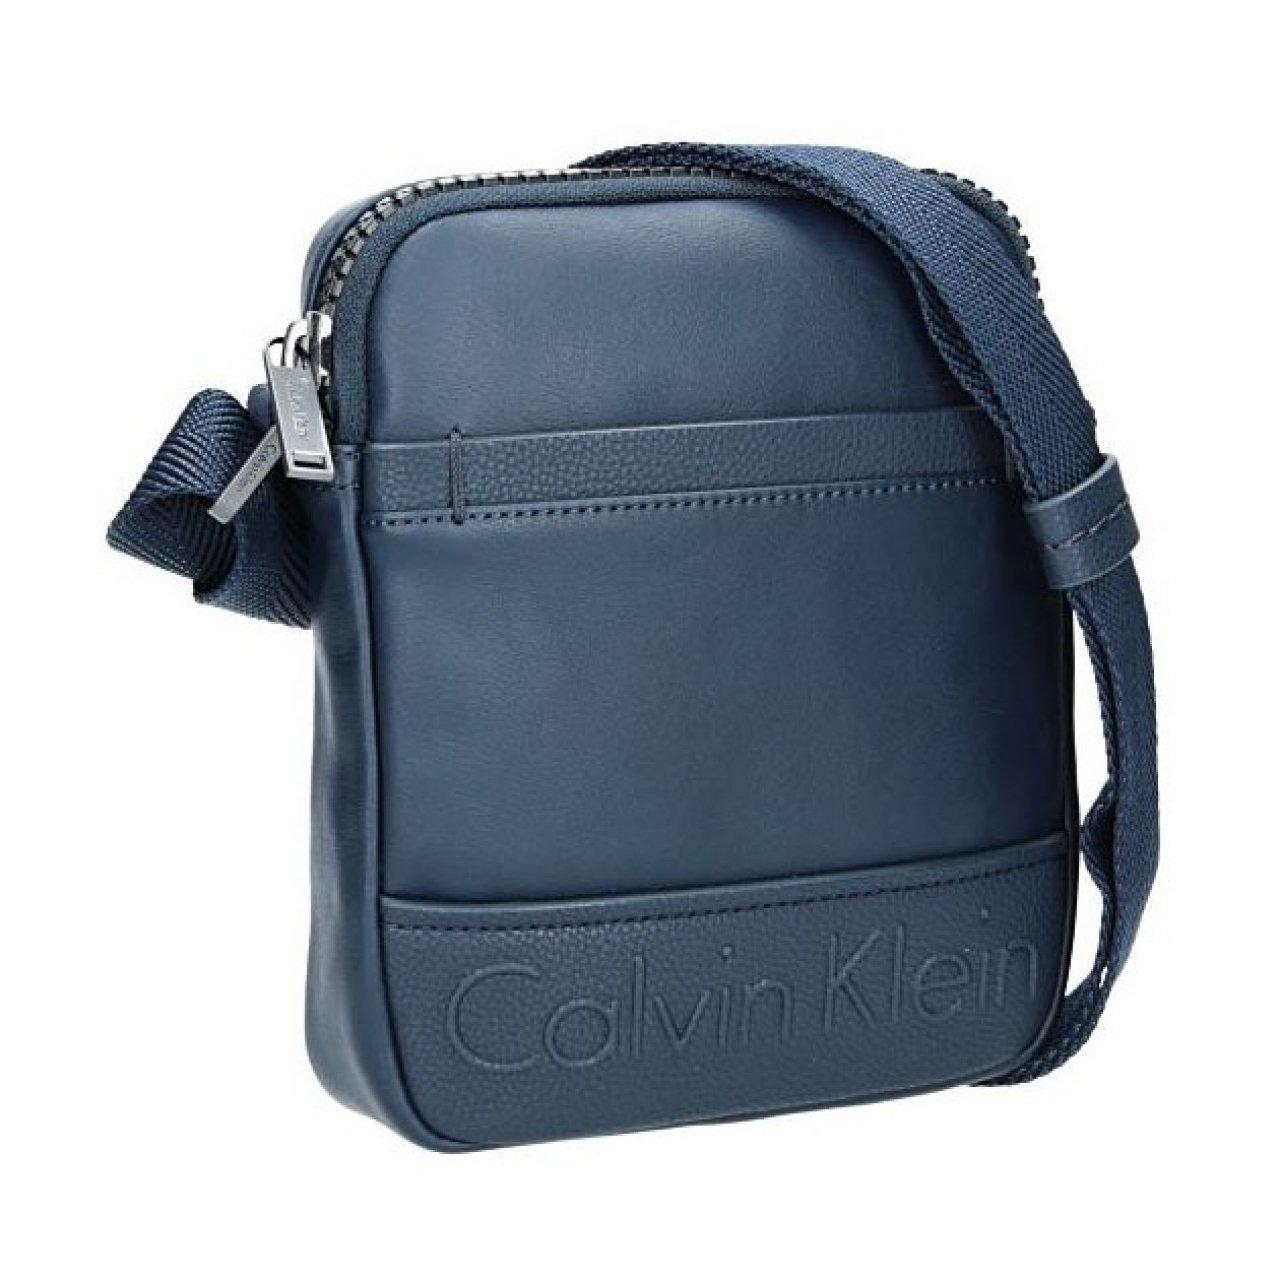 Pánská taška přes rameno Calvin Klein Landa - modrá  98bdc691e9b